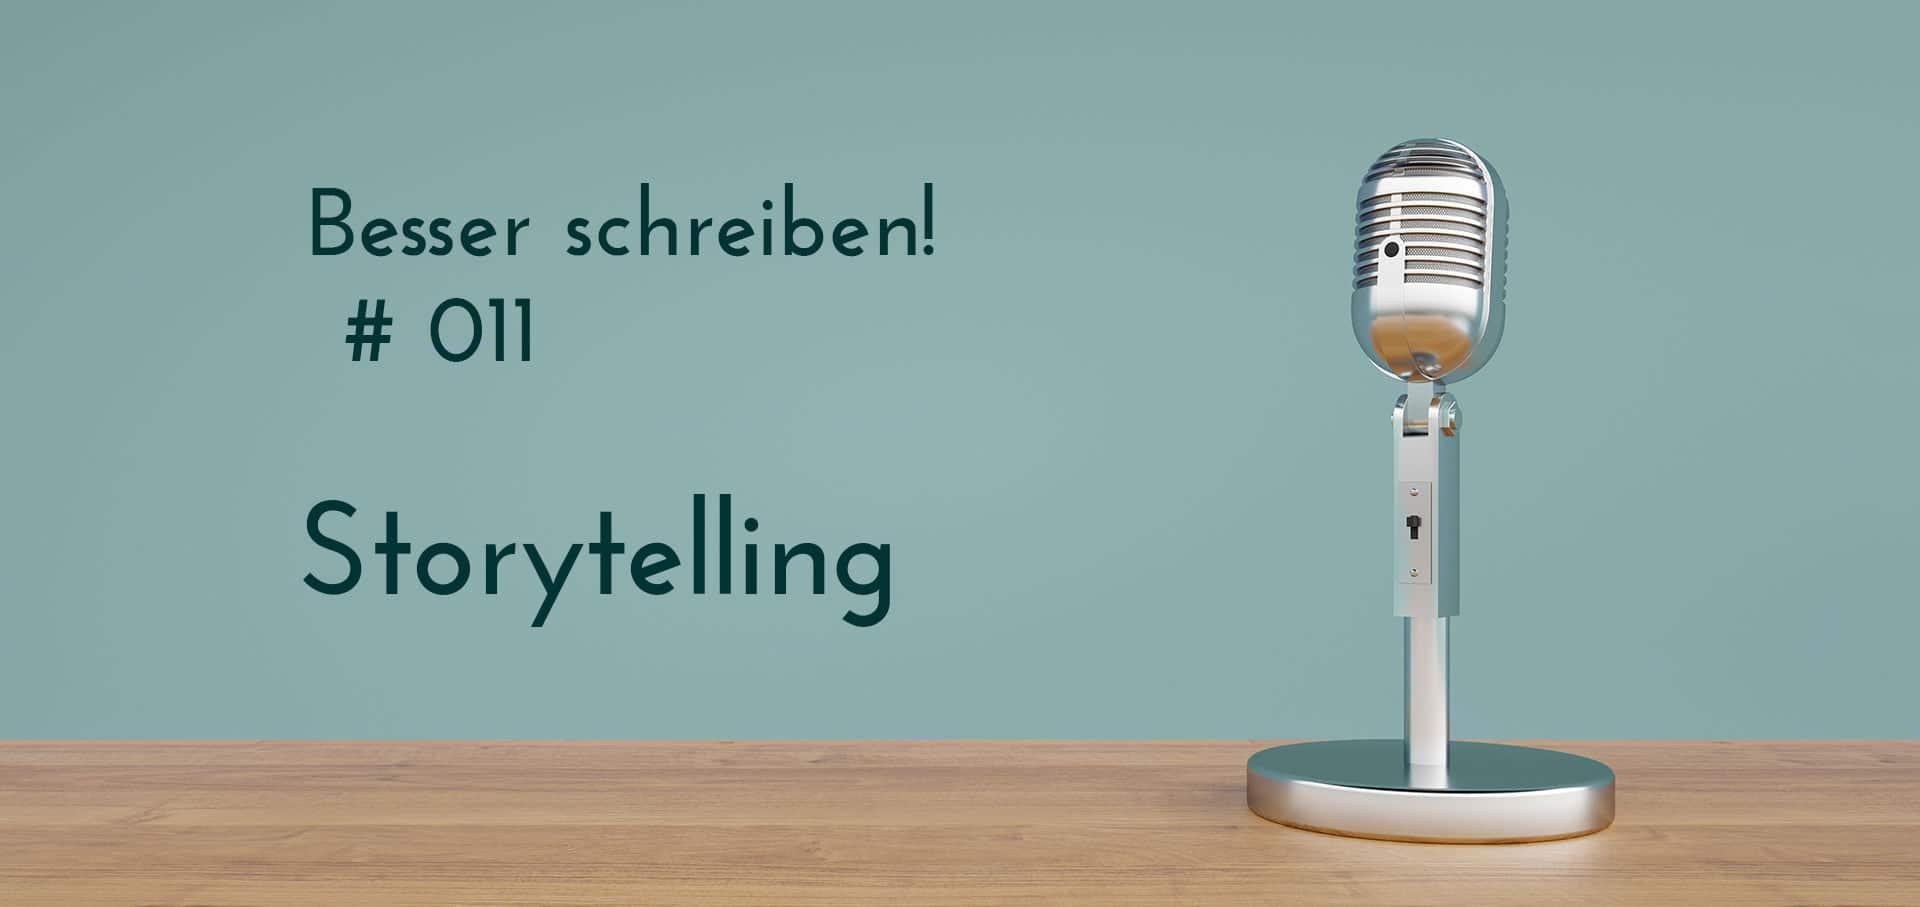 Podcastfolge Storytelling